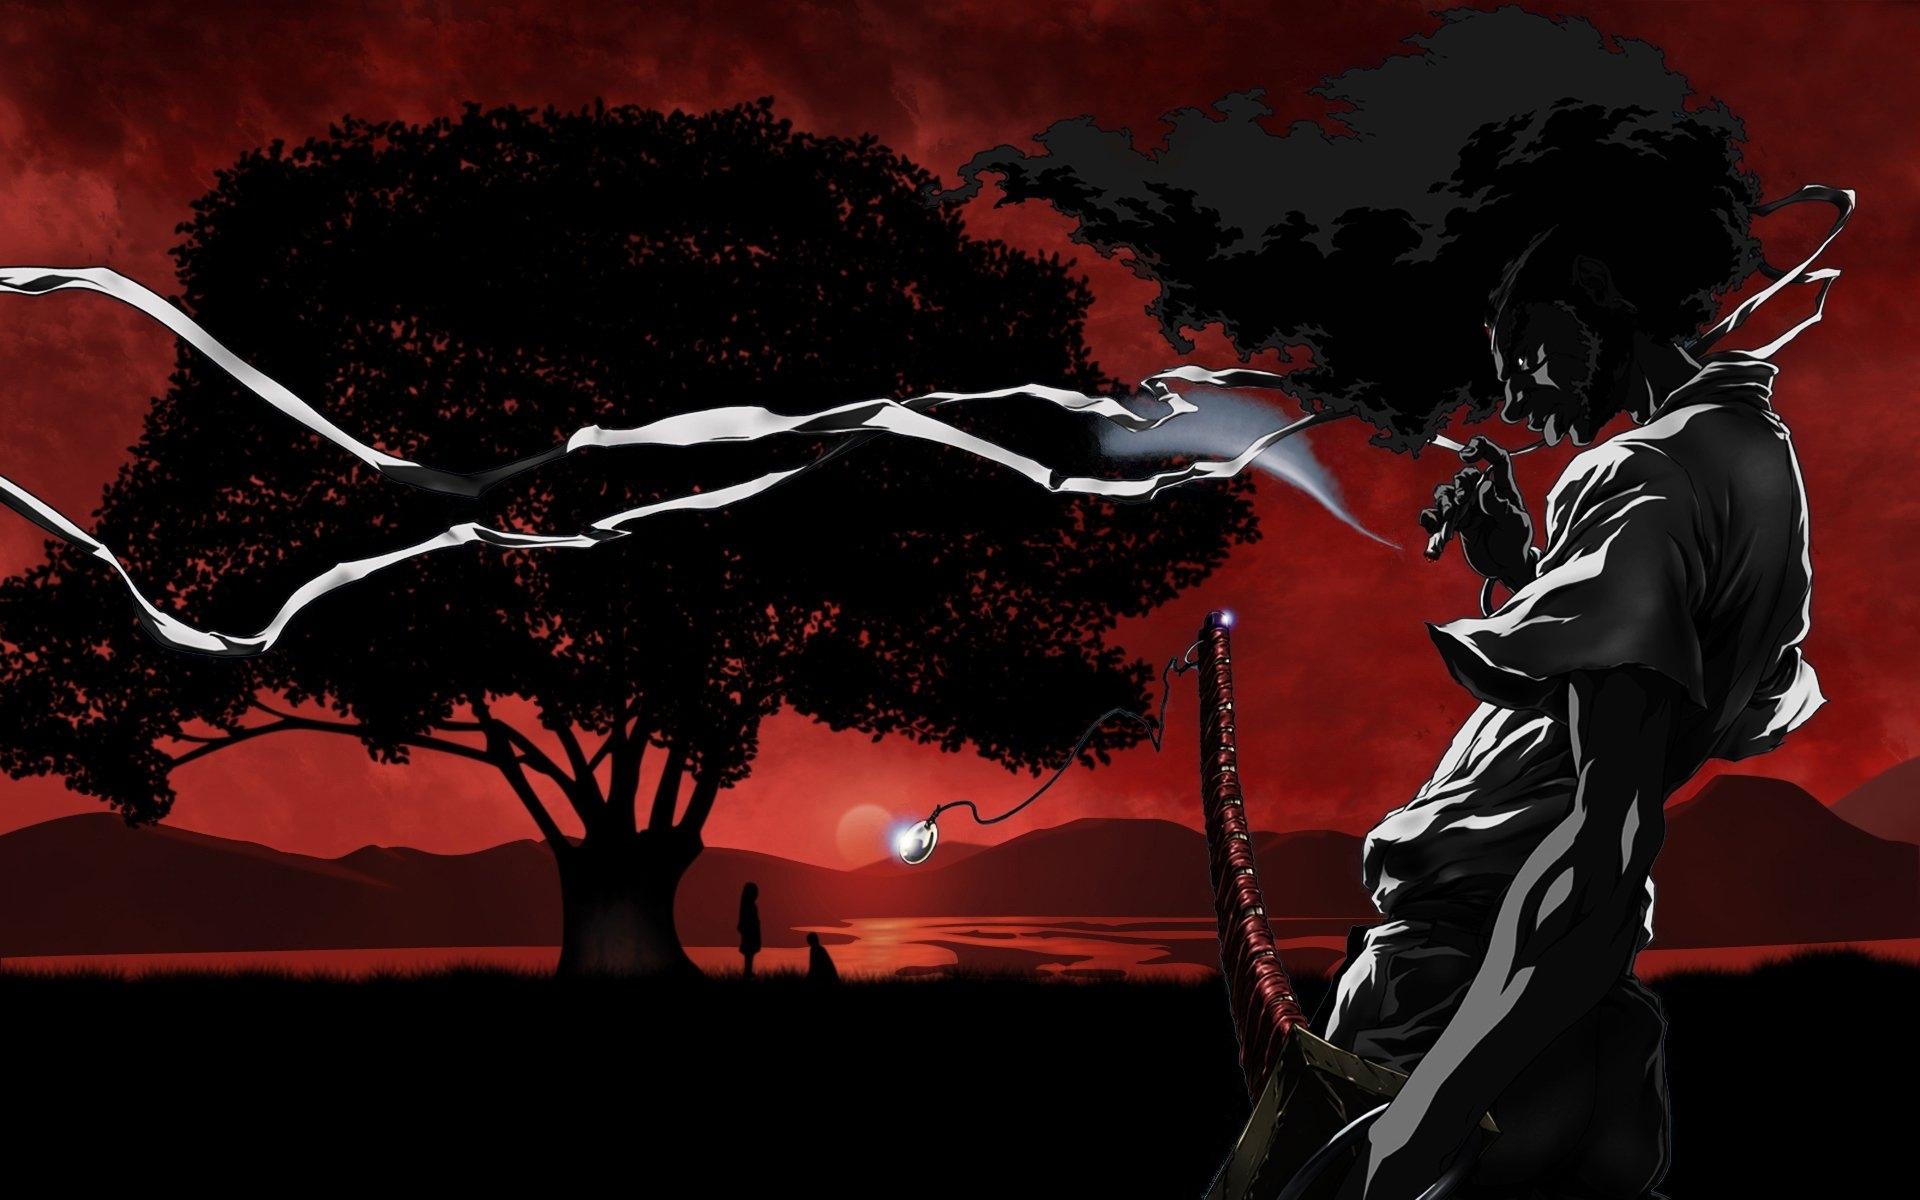 afro samurai full hd fond d'écran and arrière-plan | 1920x1200 | id